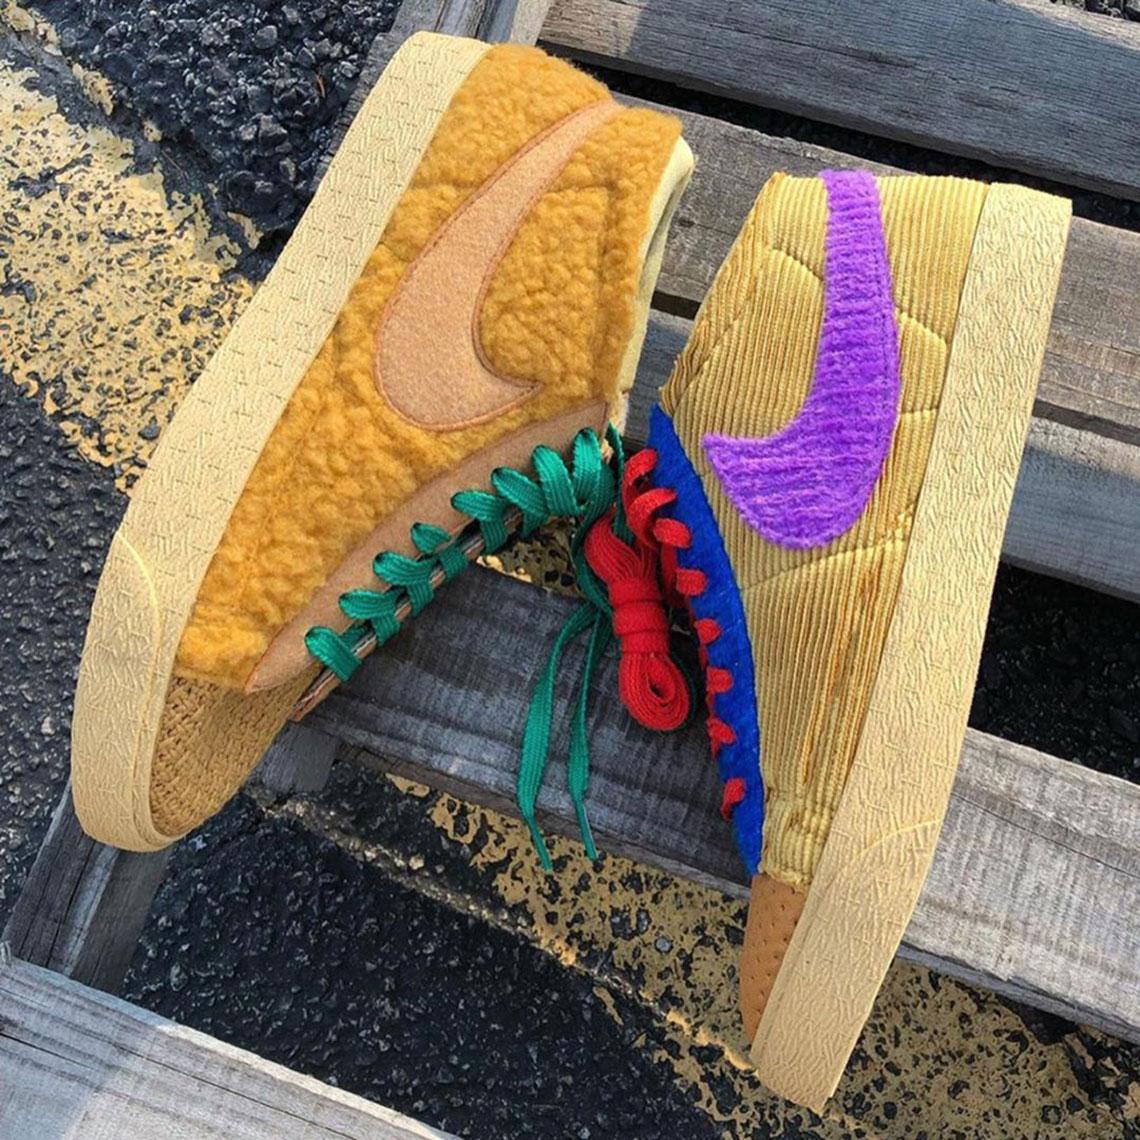 CPFM Cactus Plant Flea Market Nike